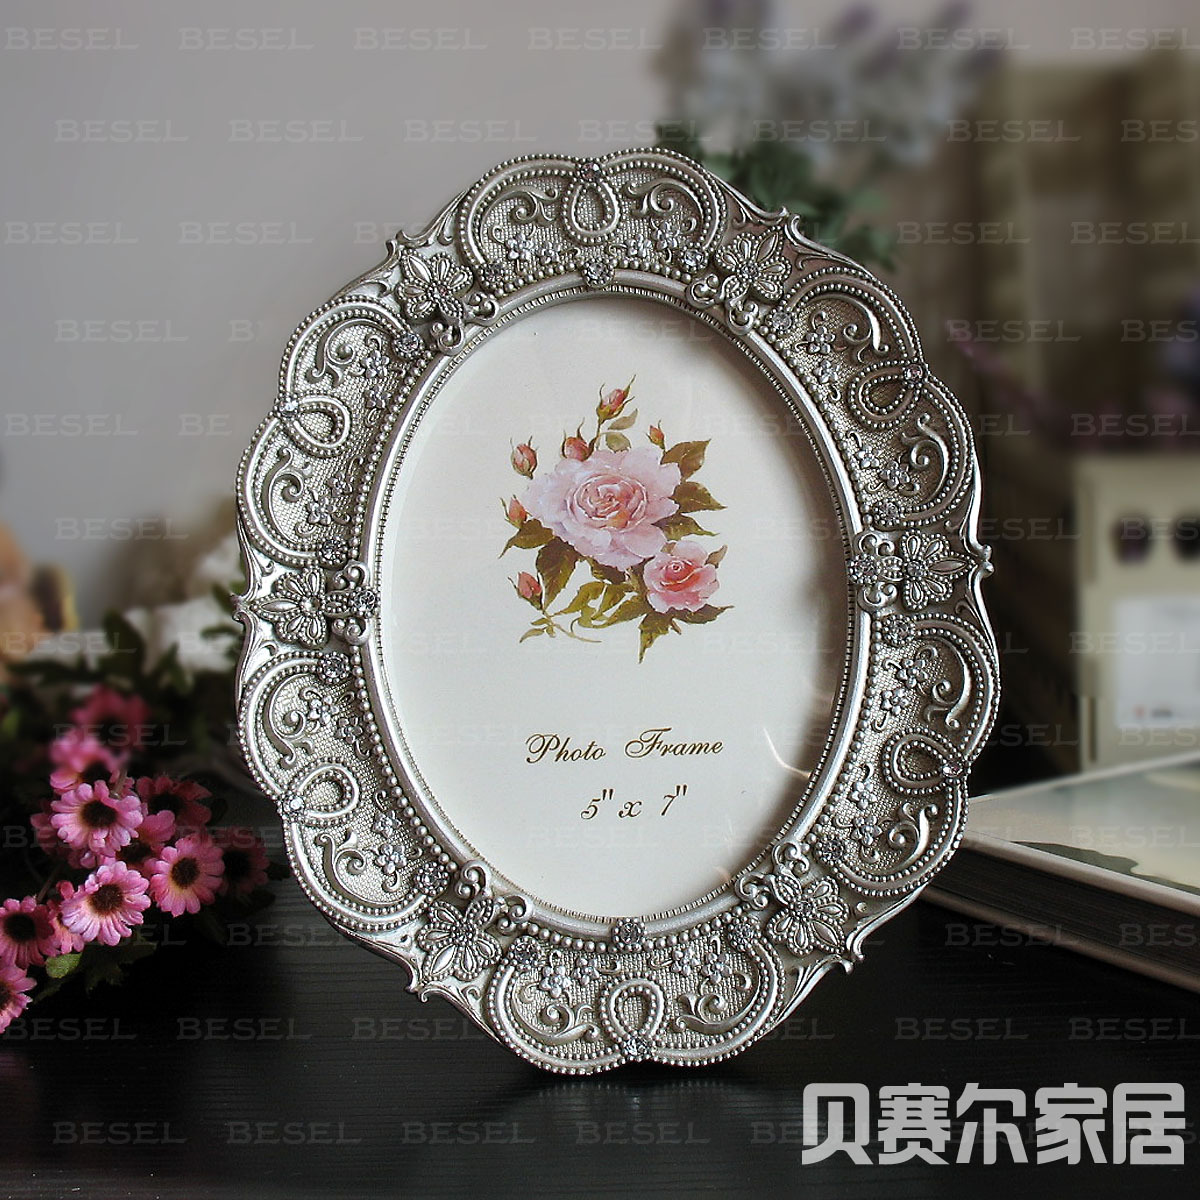 Princess Royal Vintage Baroque Art Silver Oval Resin Photo